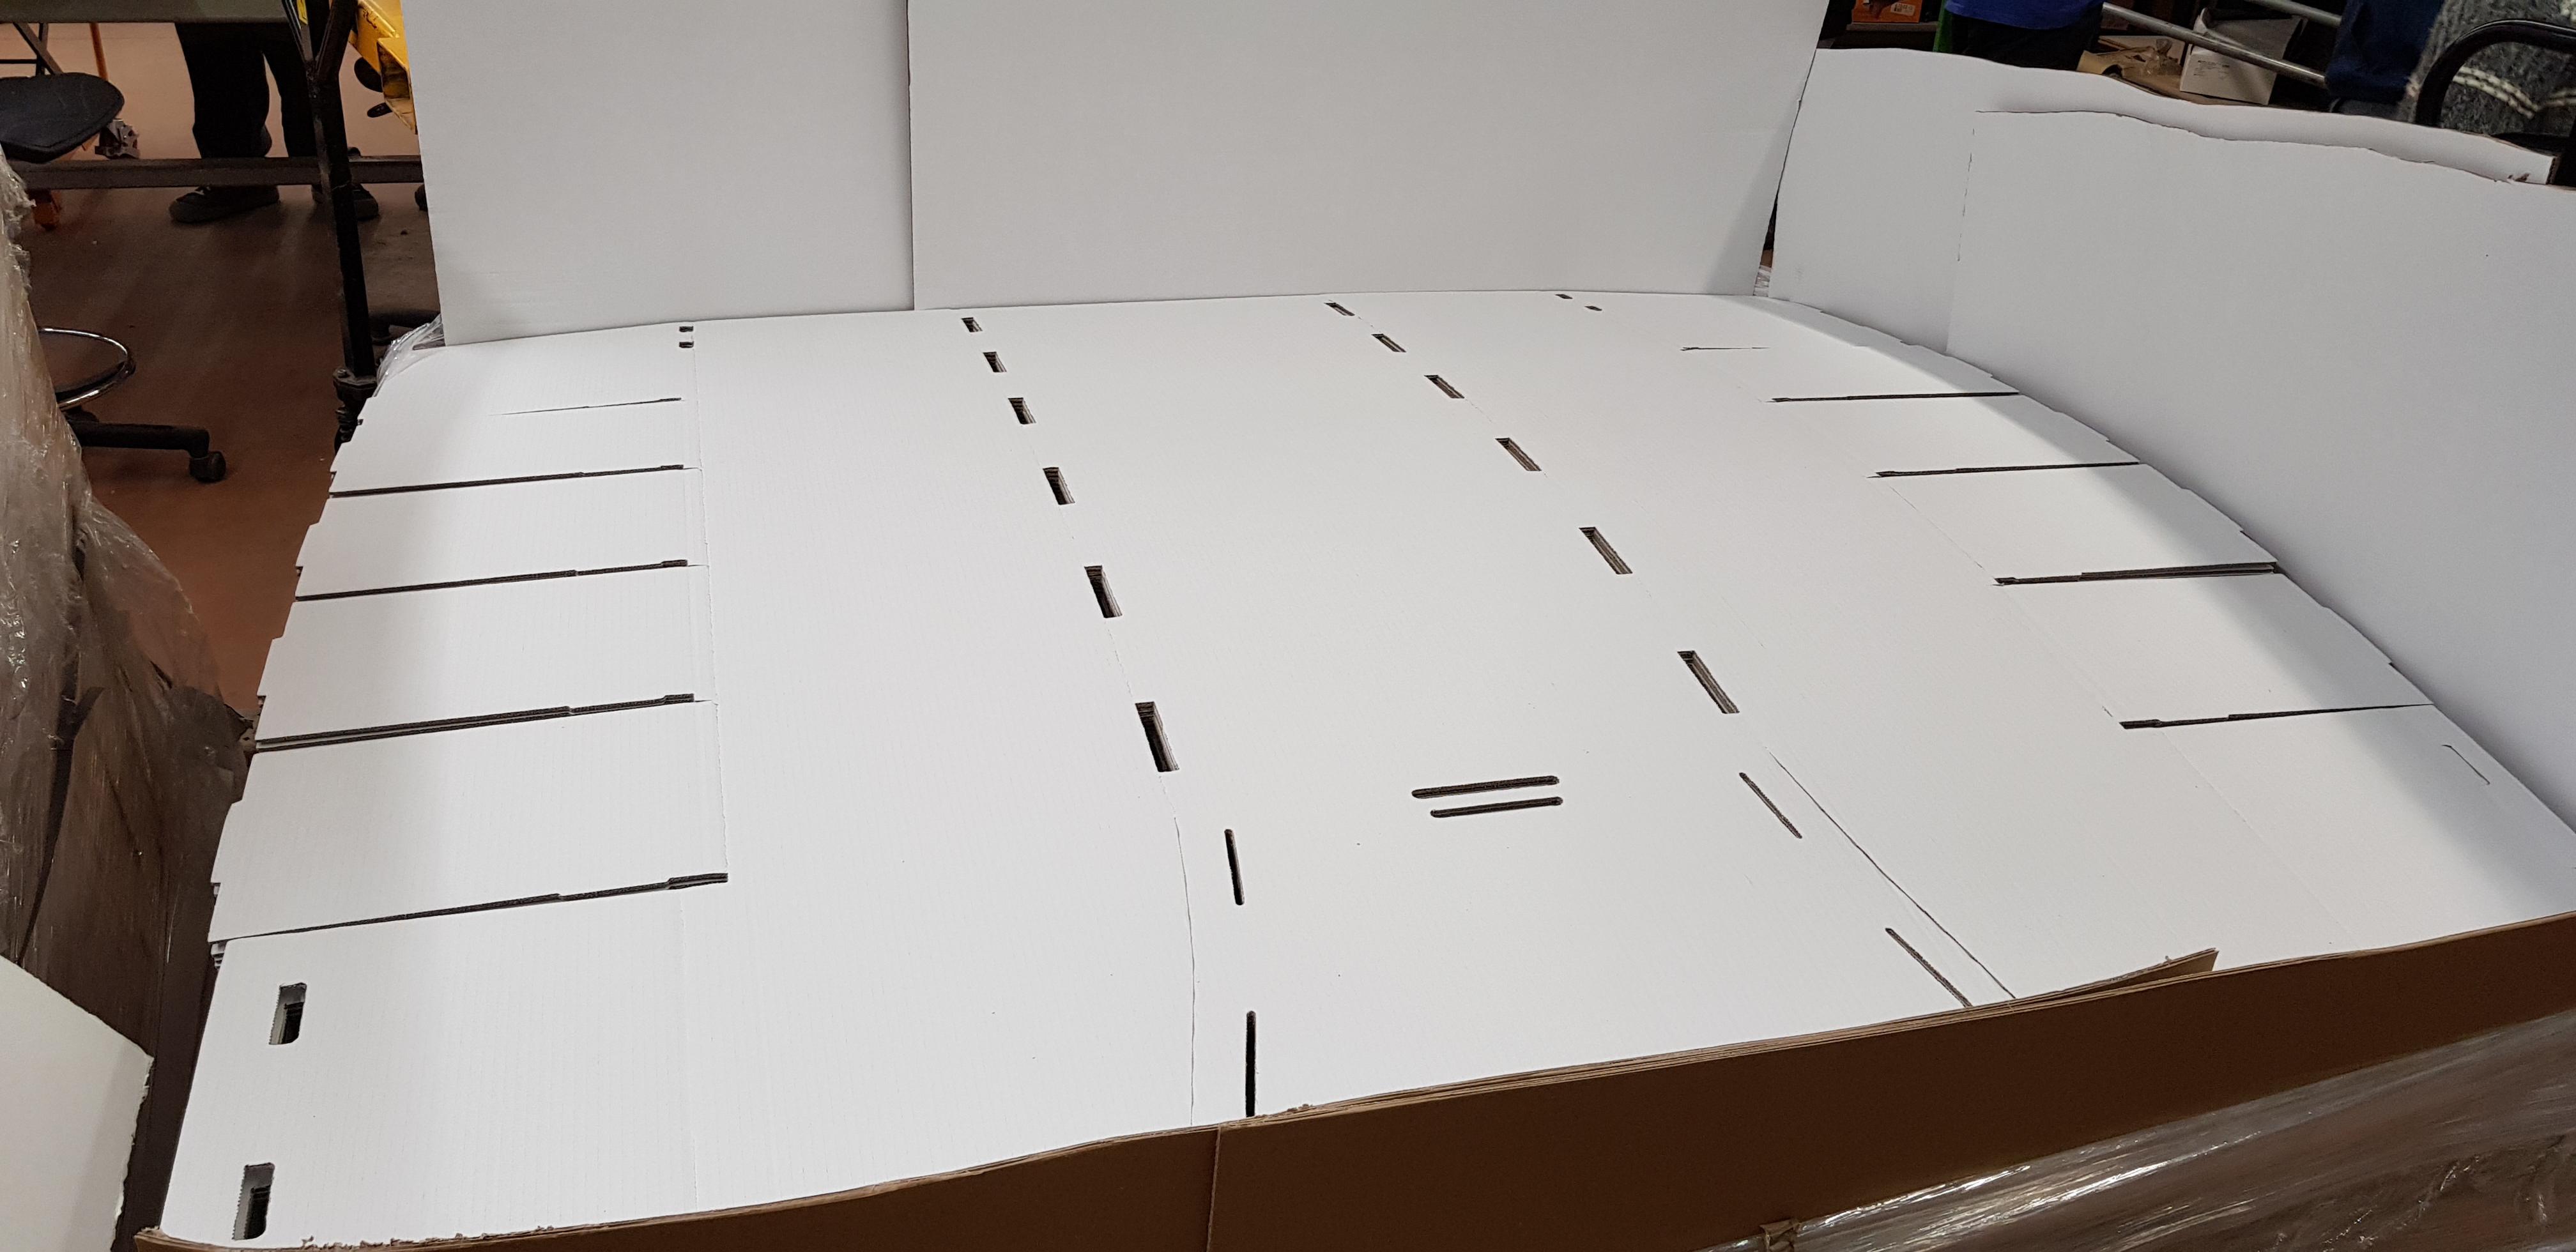 box0-ConvertImage